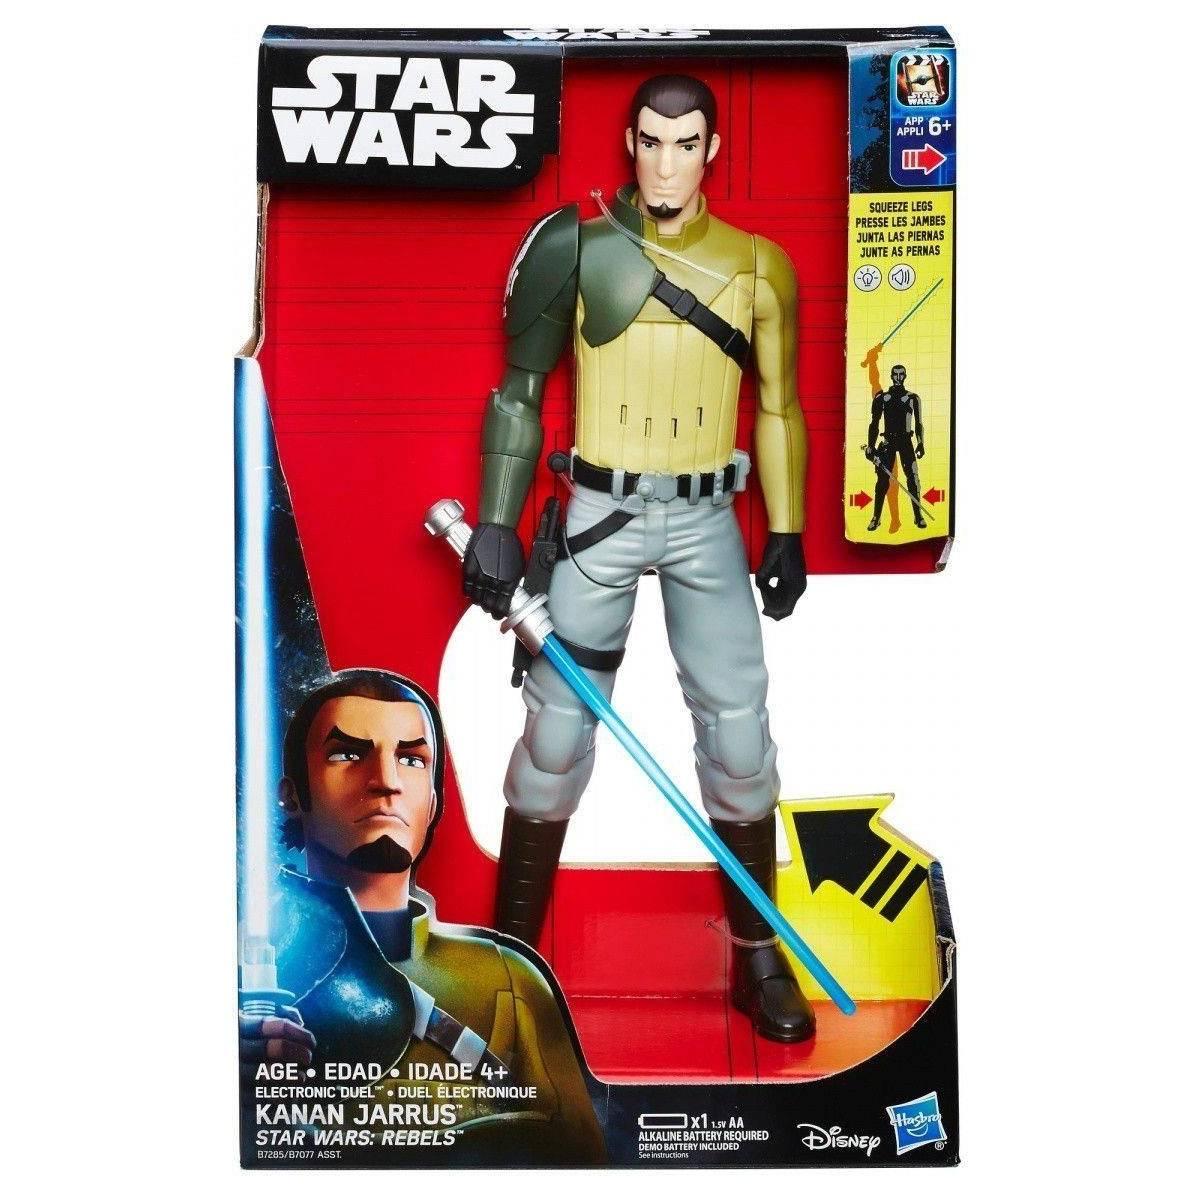 Star Wars Rebels - Figurine Electronique Kanan Jarrus 30 cm - B7285